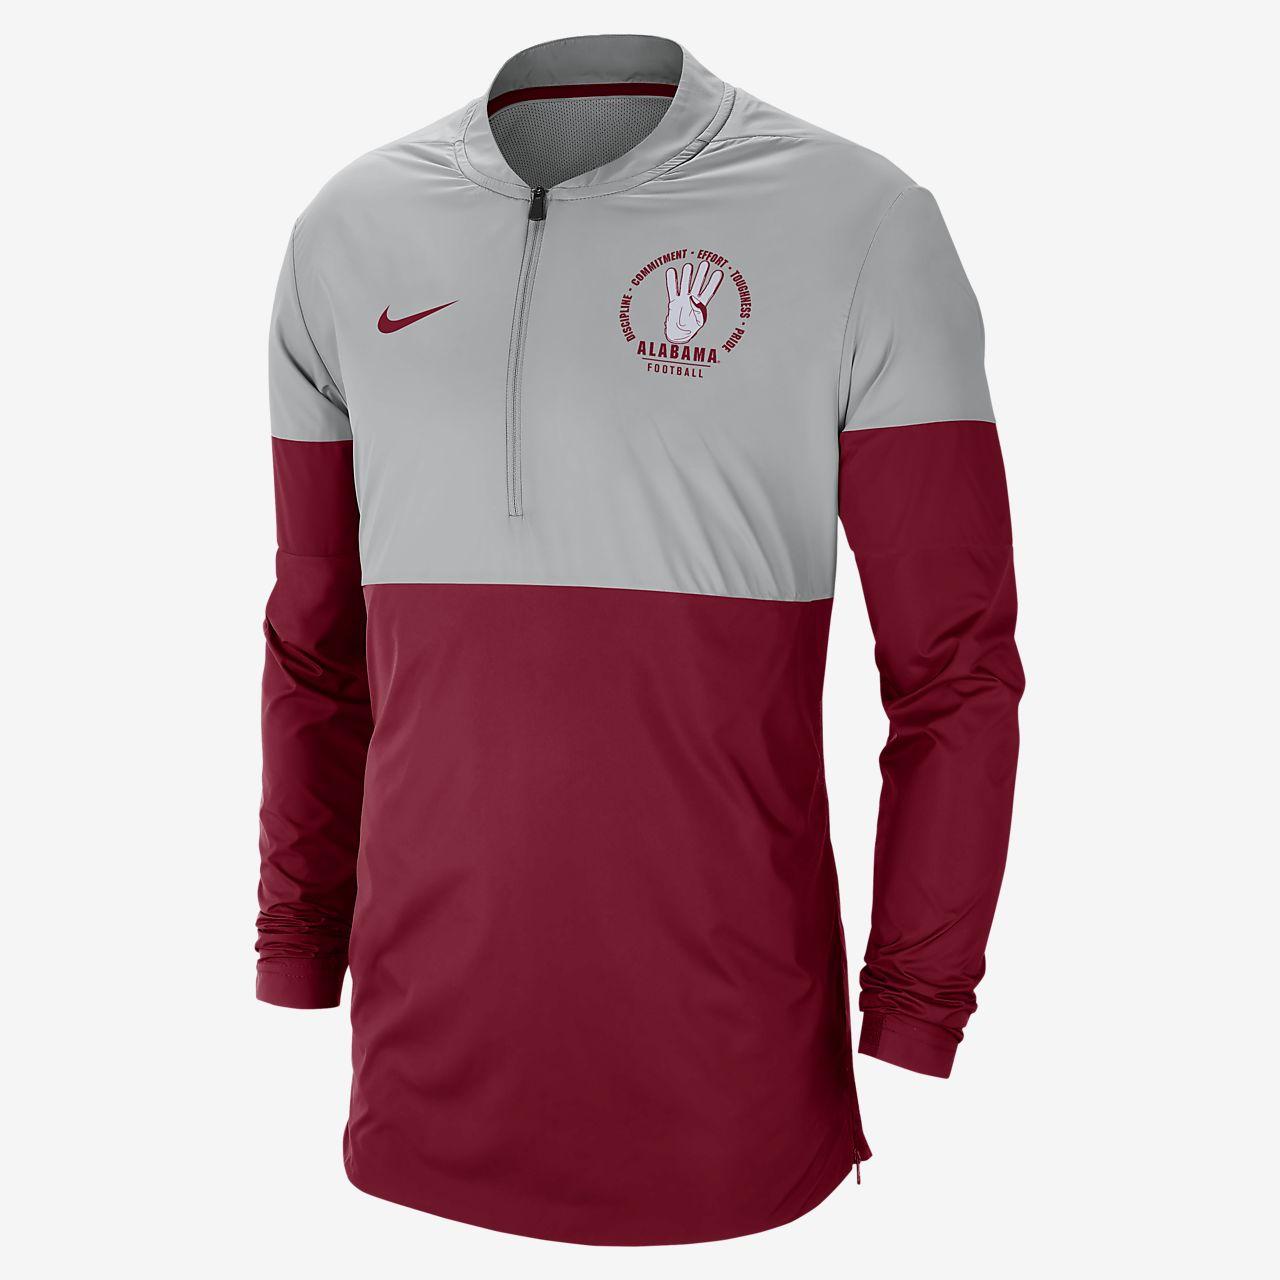 Nike College (Alabama) Men's Jacket